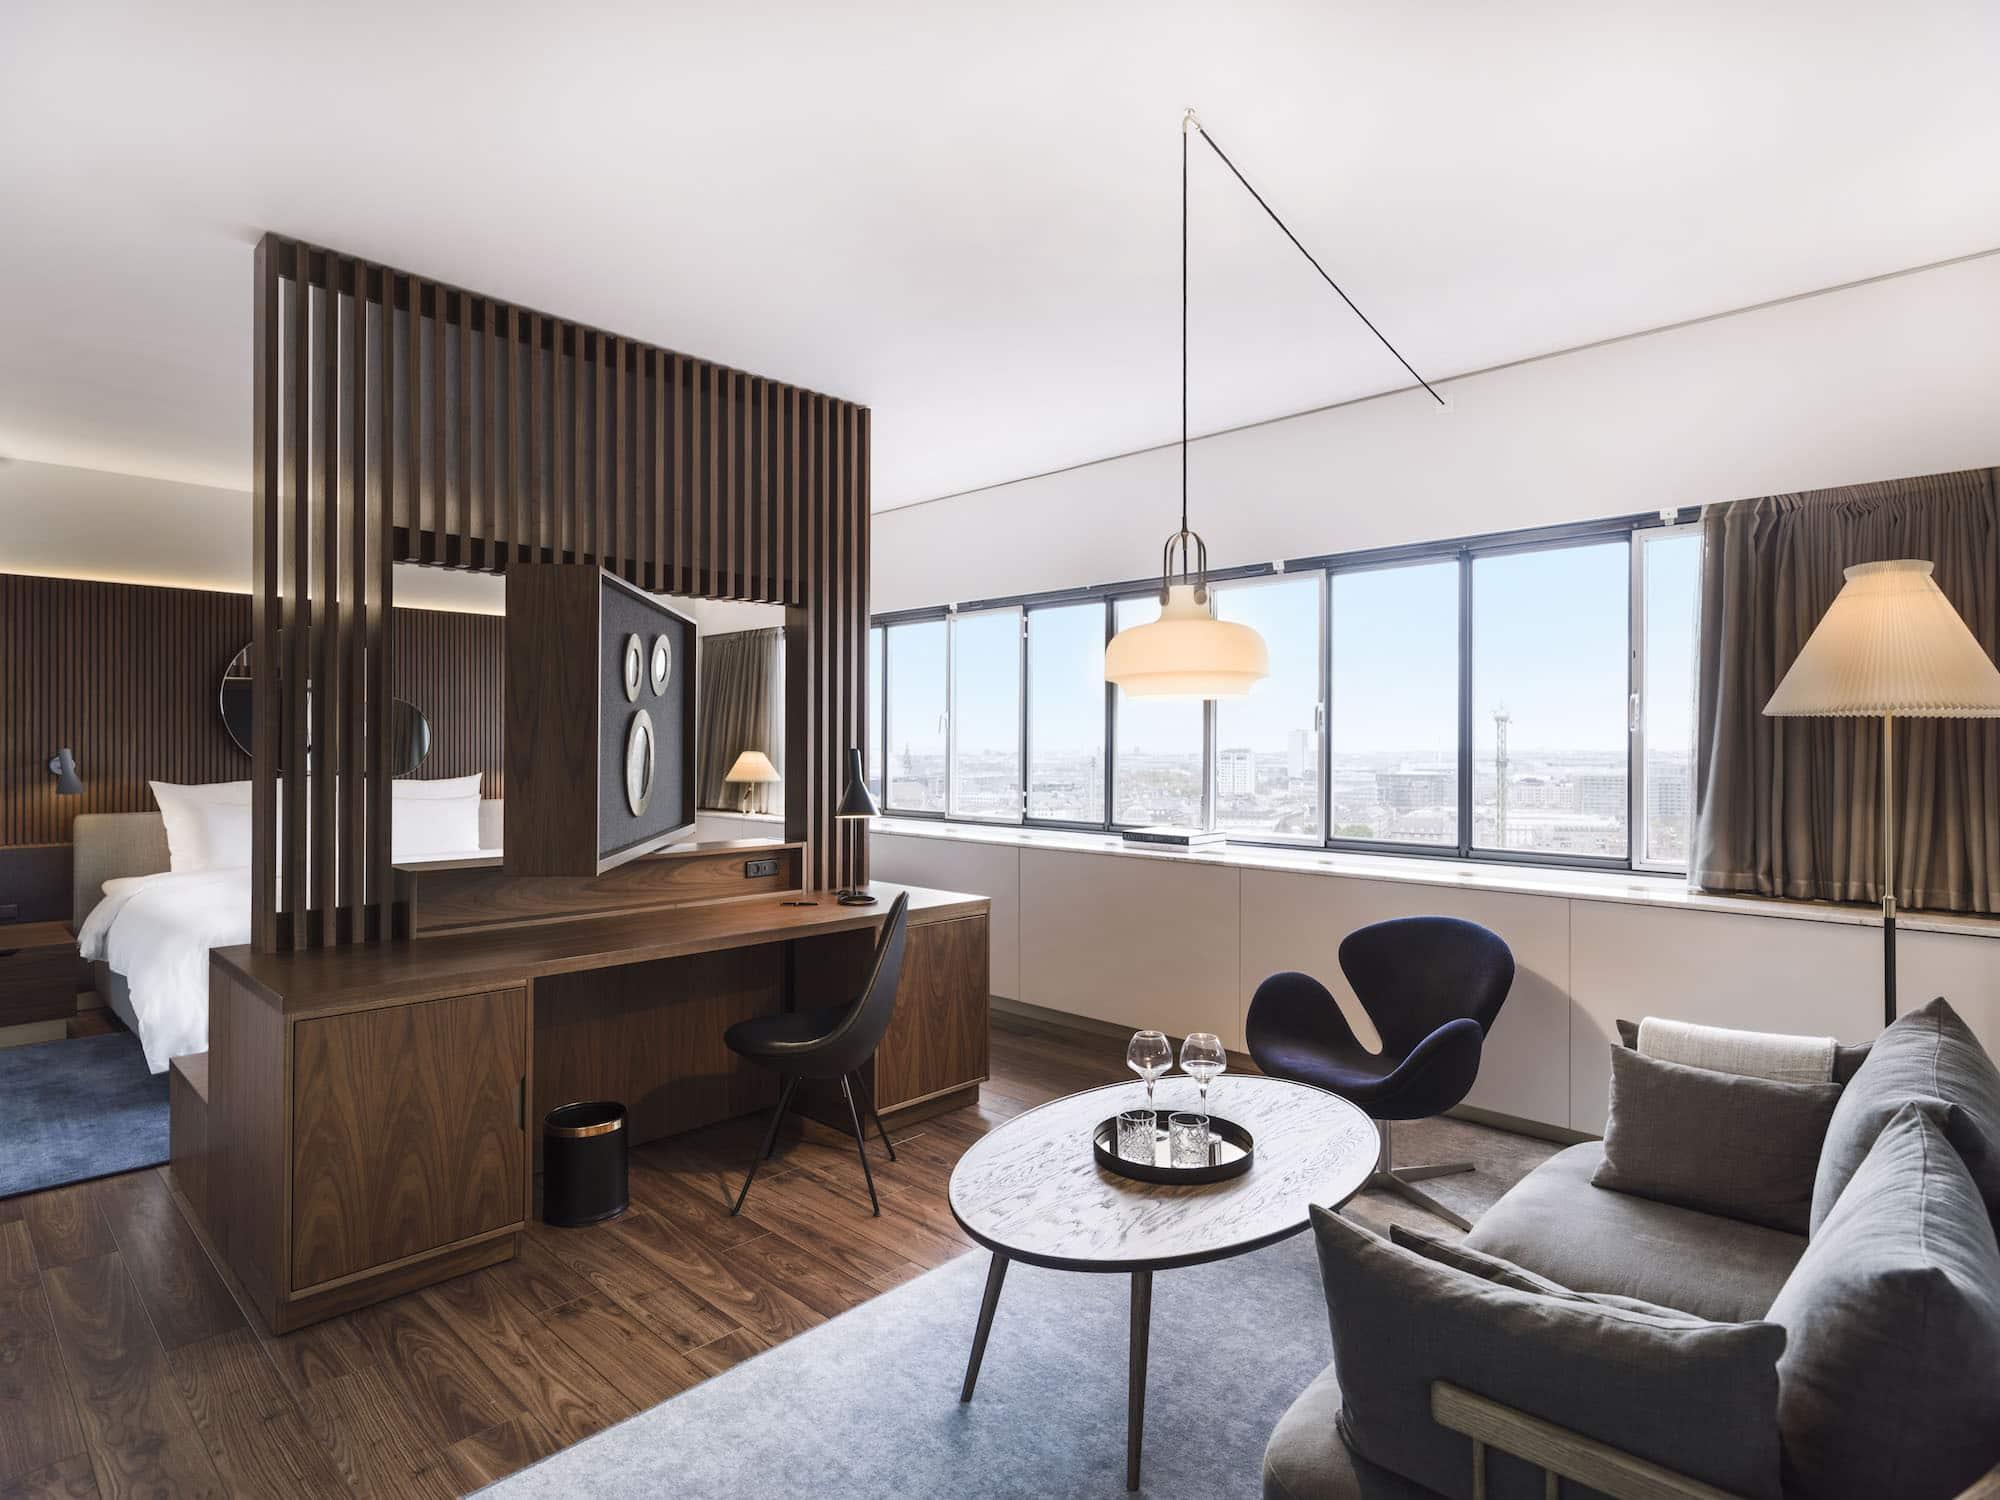 A modernist guest room at the Radisson Blu Royal Hotel in Copenhagen designed by Arne Jacobsen